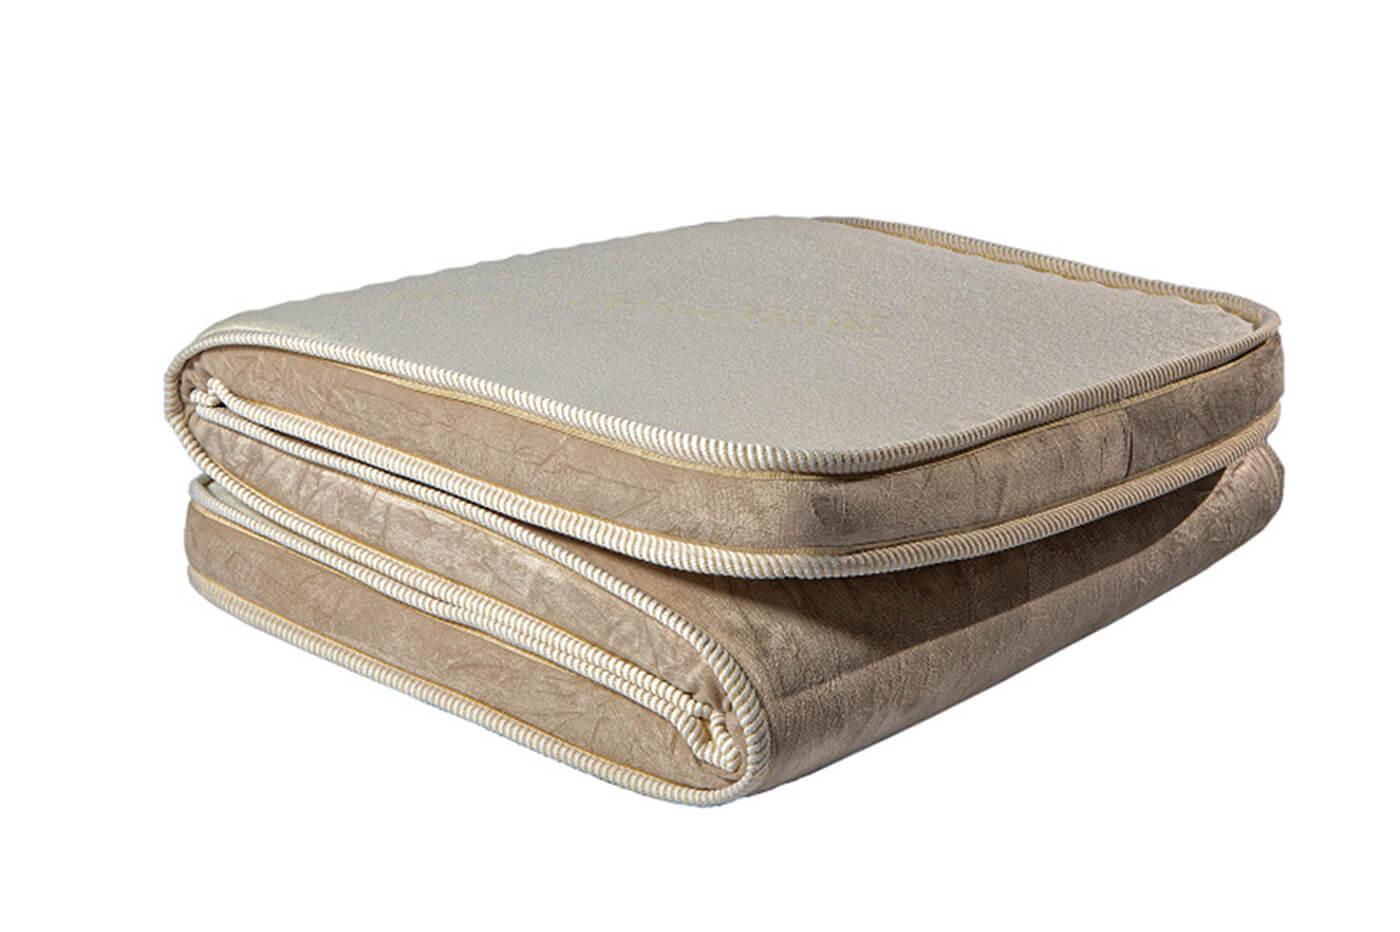 Colchonete Dobrável Futon Medida 70cm x 190cm x 7cm   - Kenko Premium Colchões